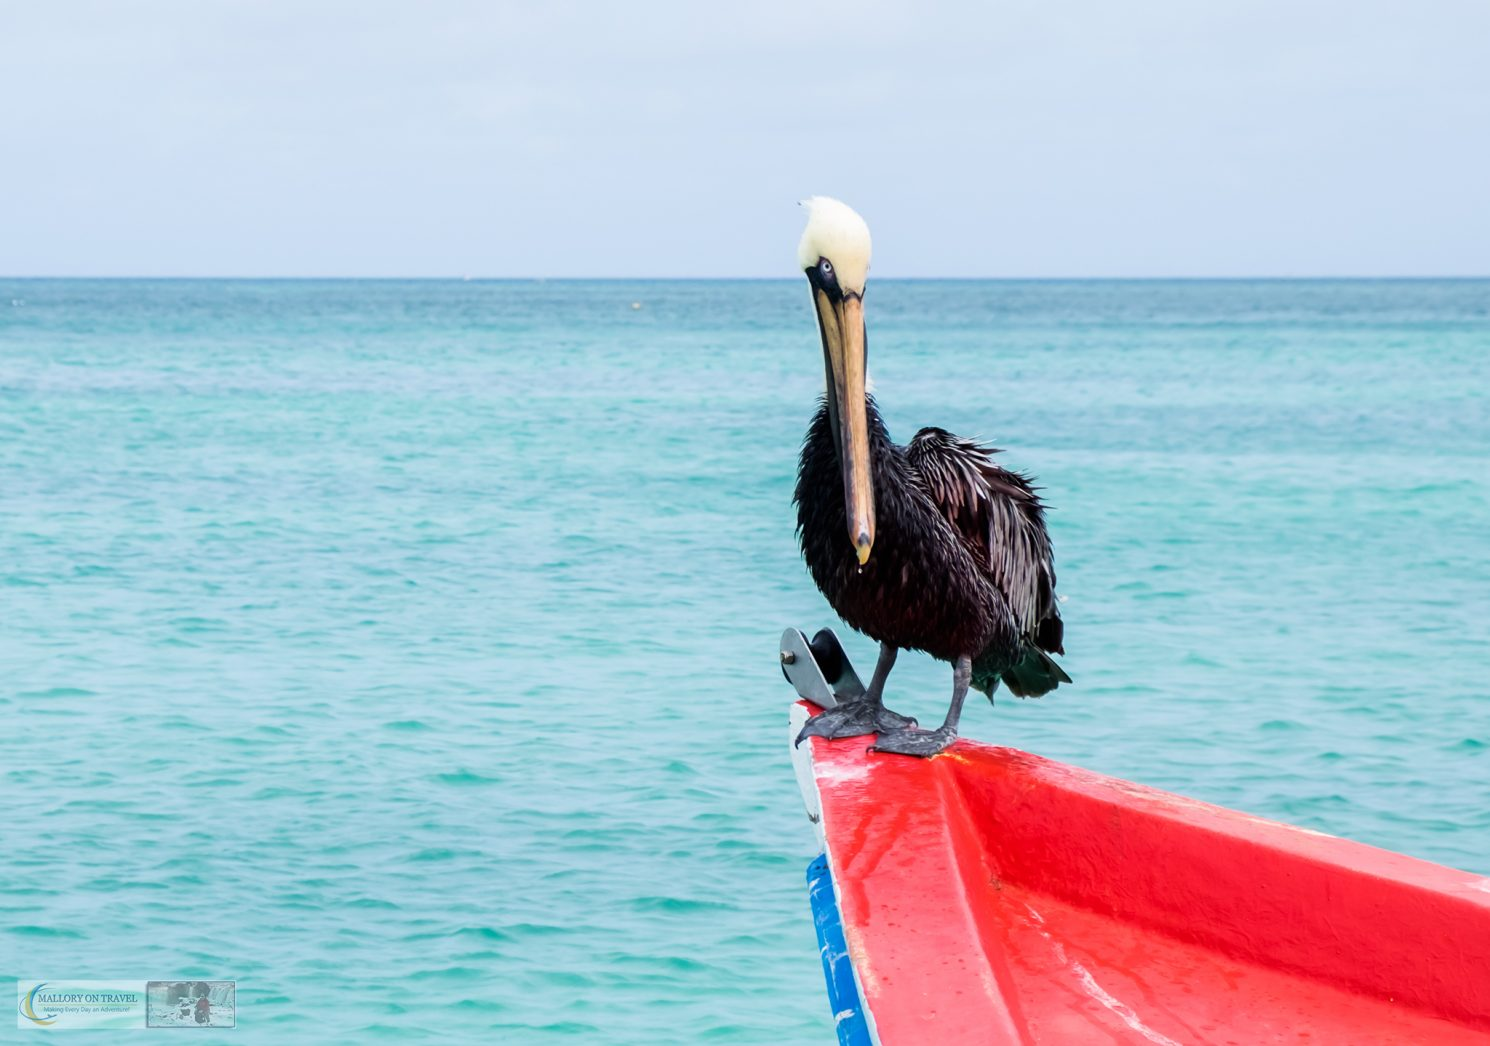 A pelican at the quayside on the Caribbean island of Aruba on Mallory on Travel adventure travel, photography, travel iain-mallory_aruba-1